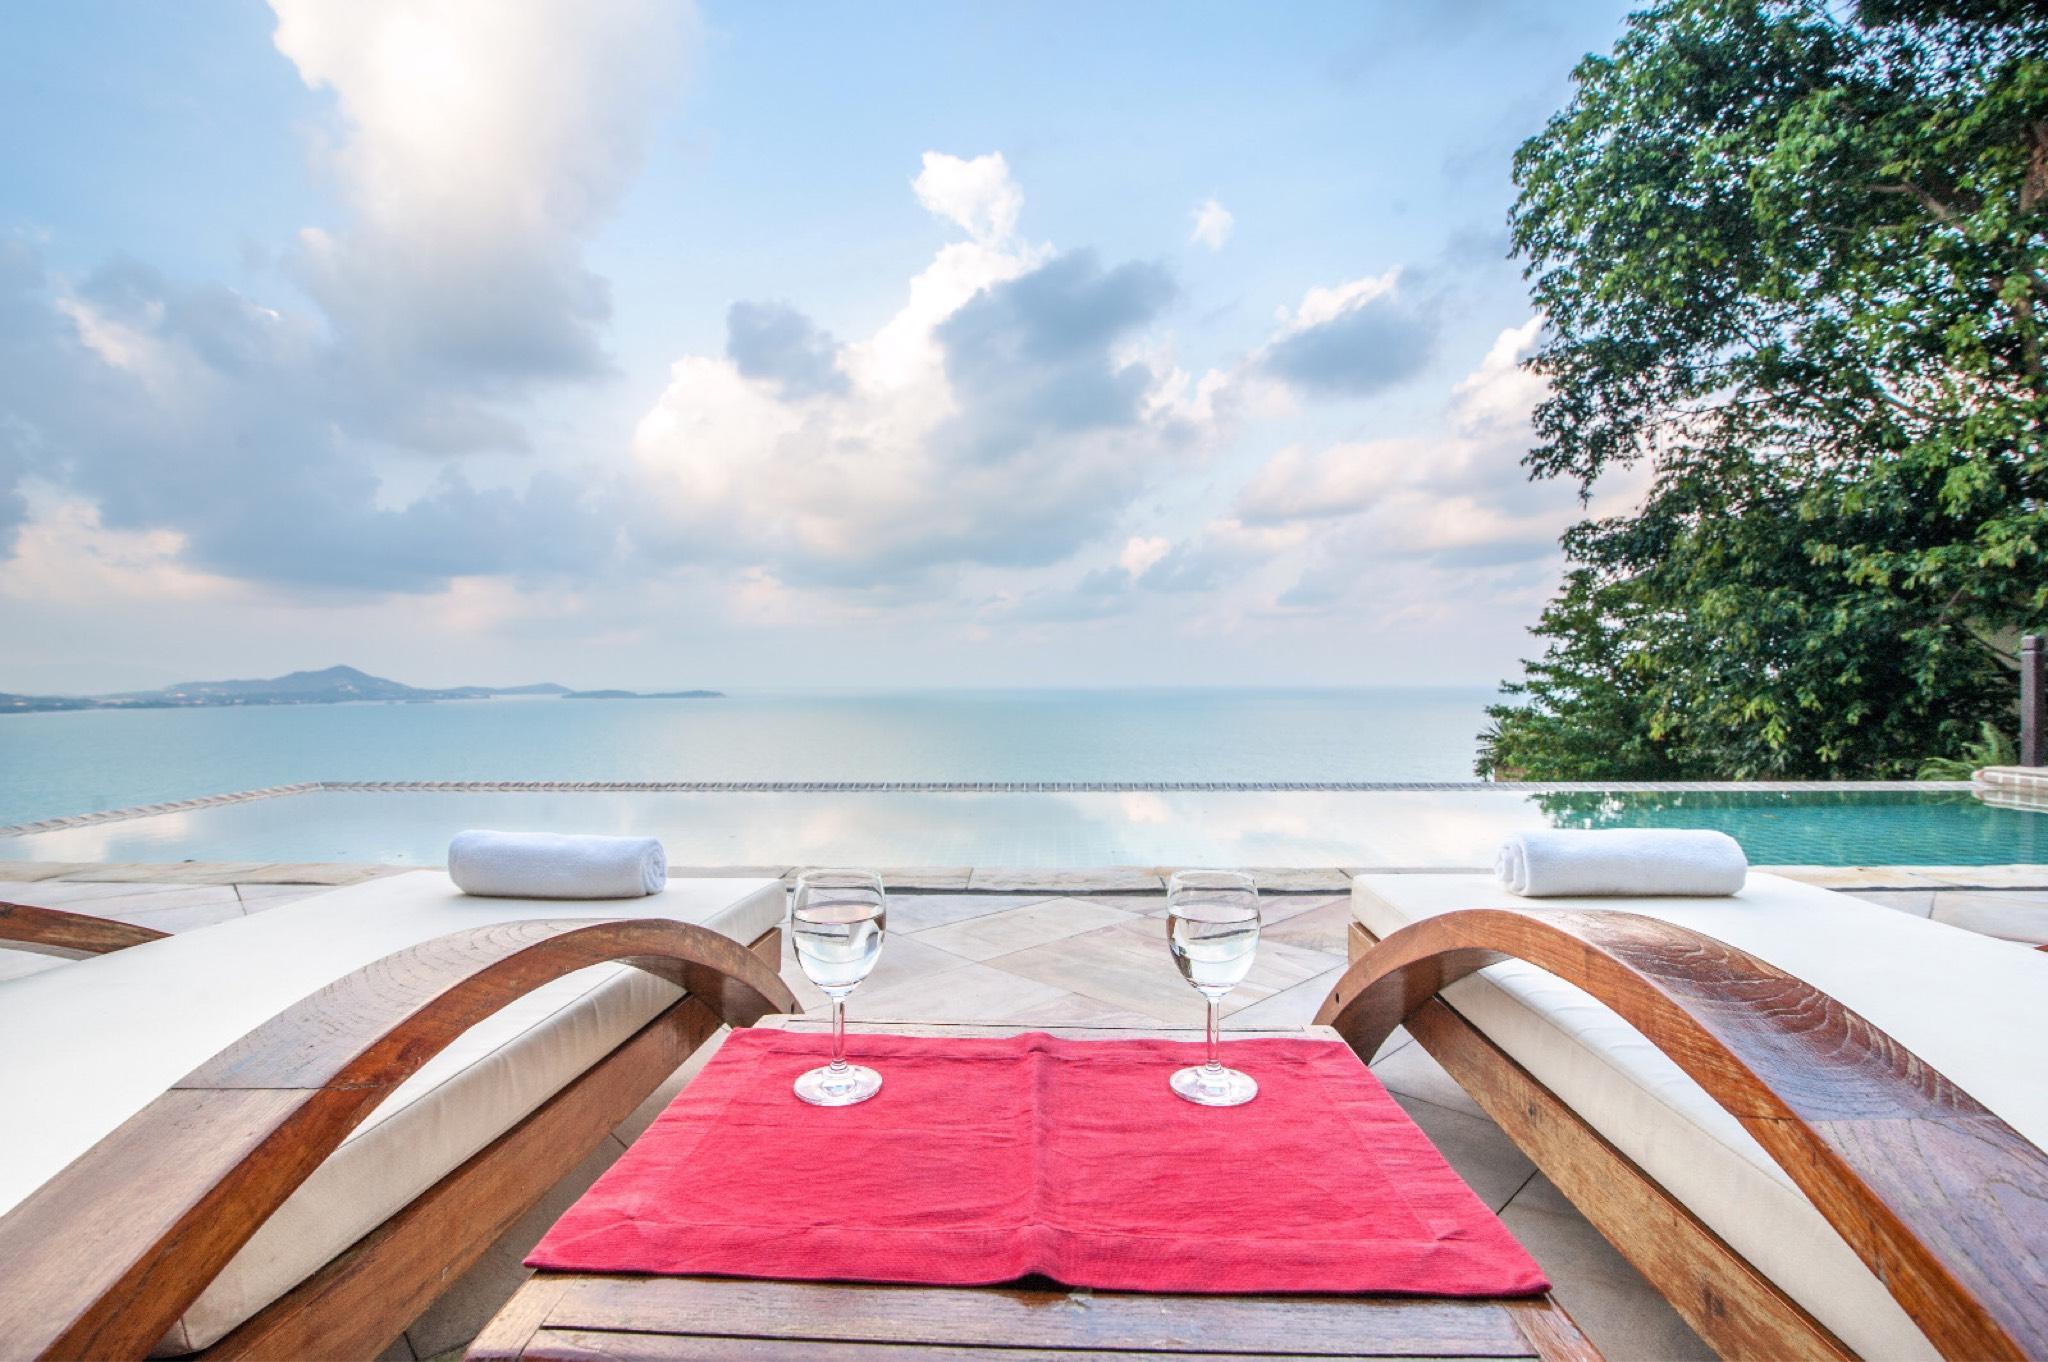 #Villa LOTUS Infinity pool with Seaview 3 BR# #Villa LOTUS Infinity pool with Seaview 3 BR#